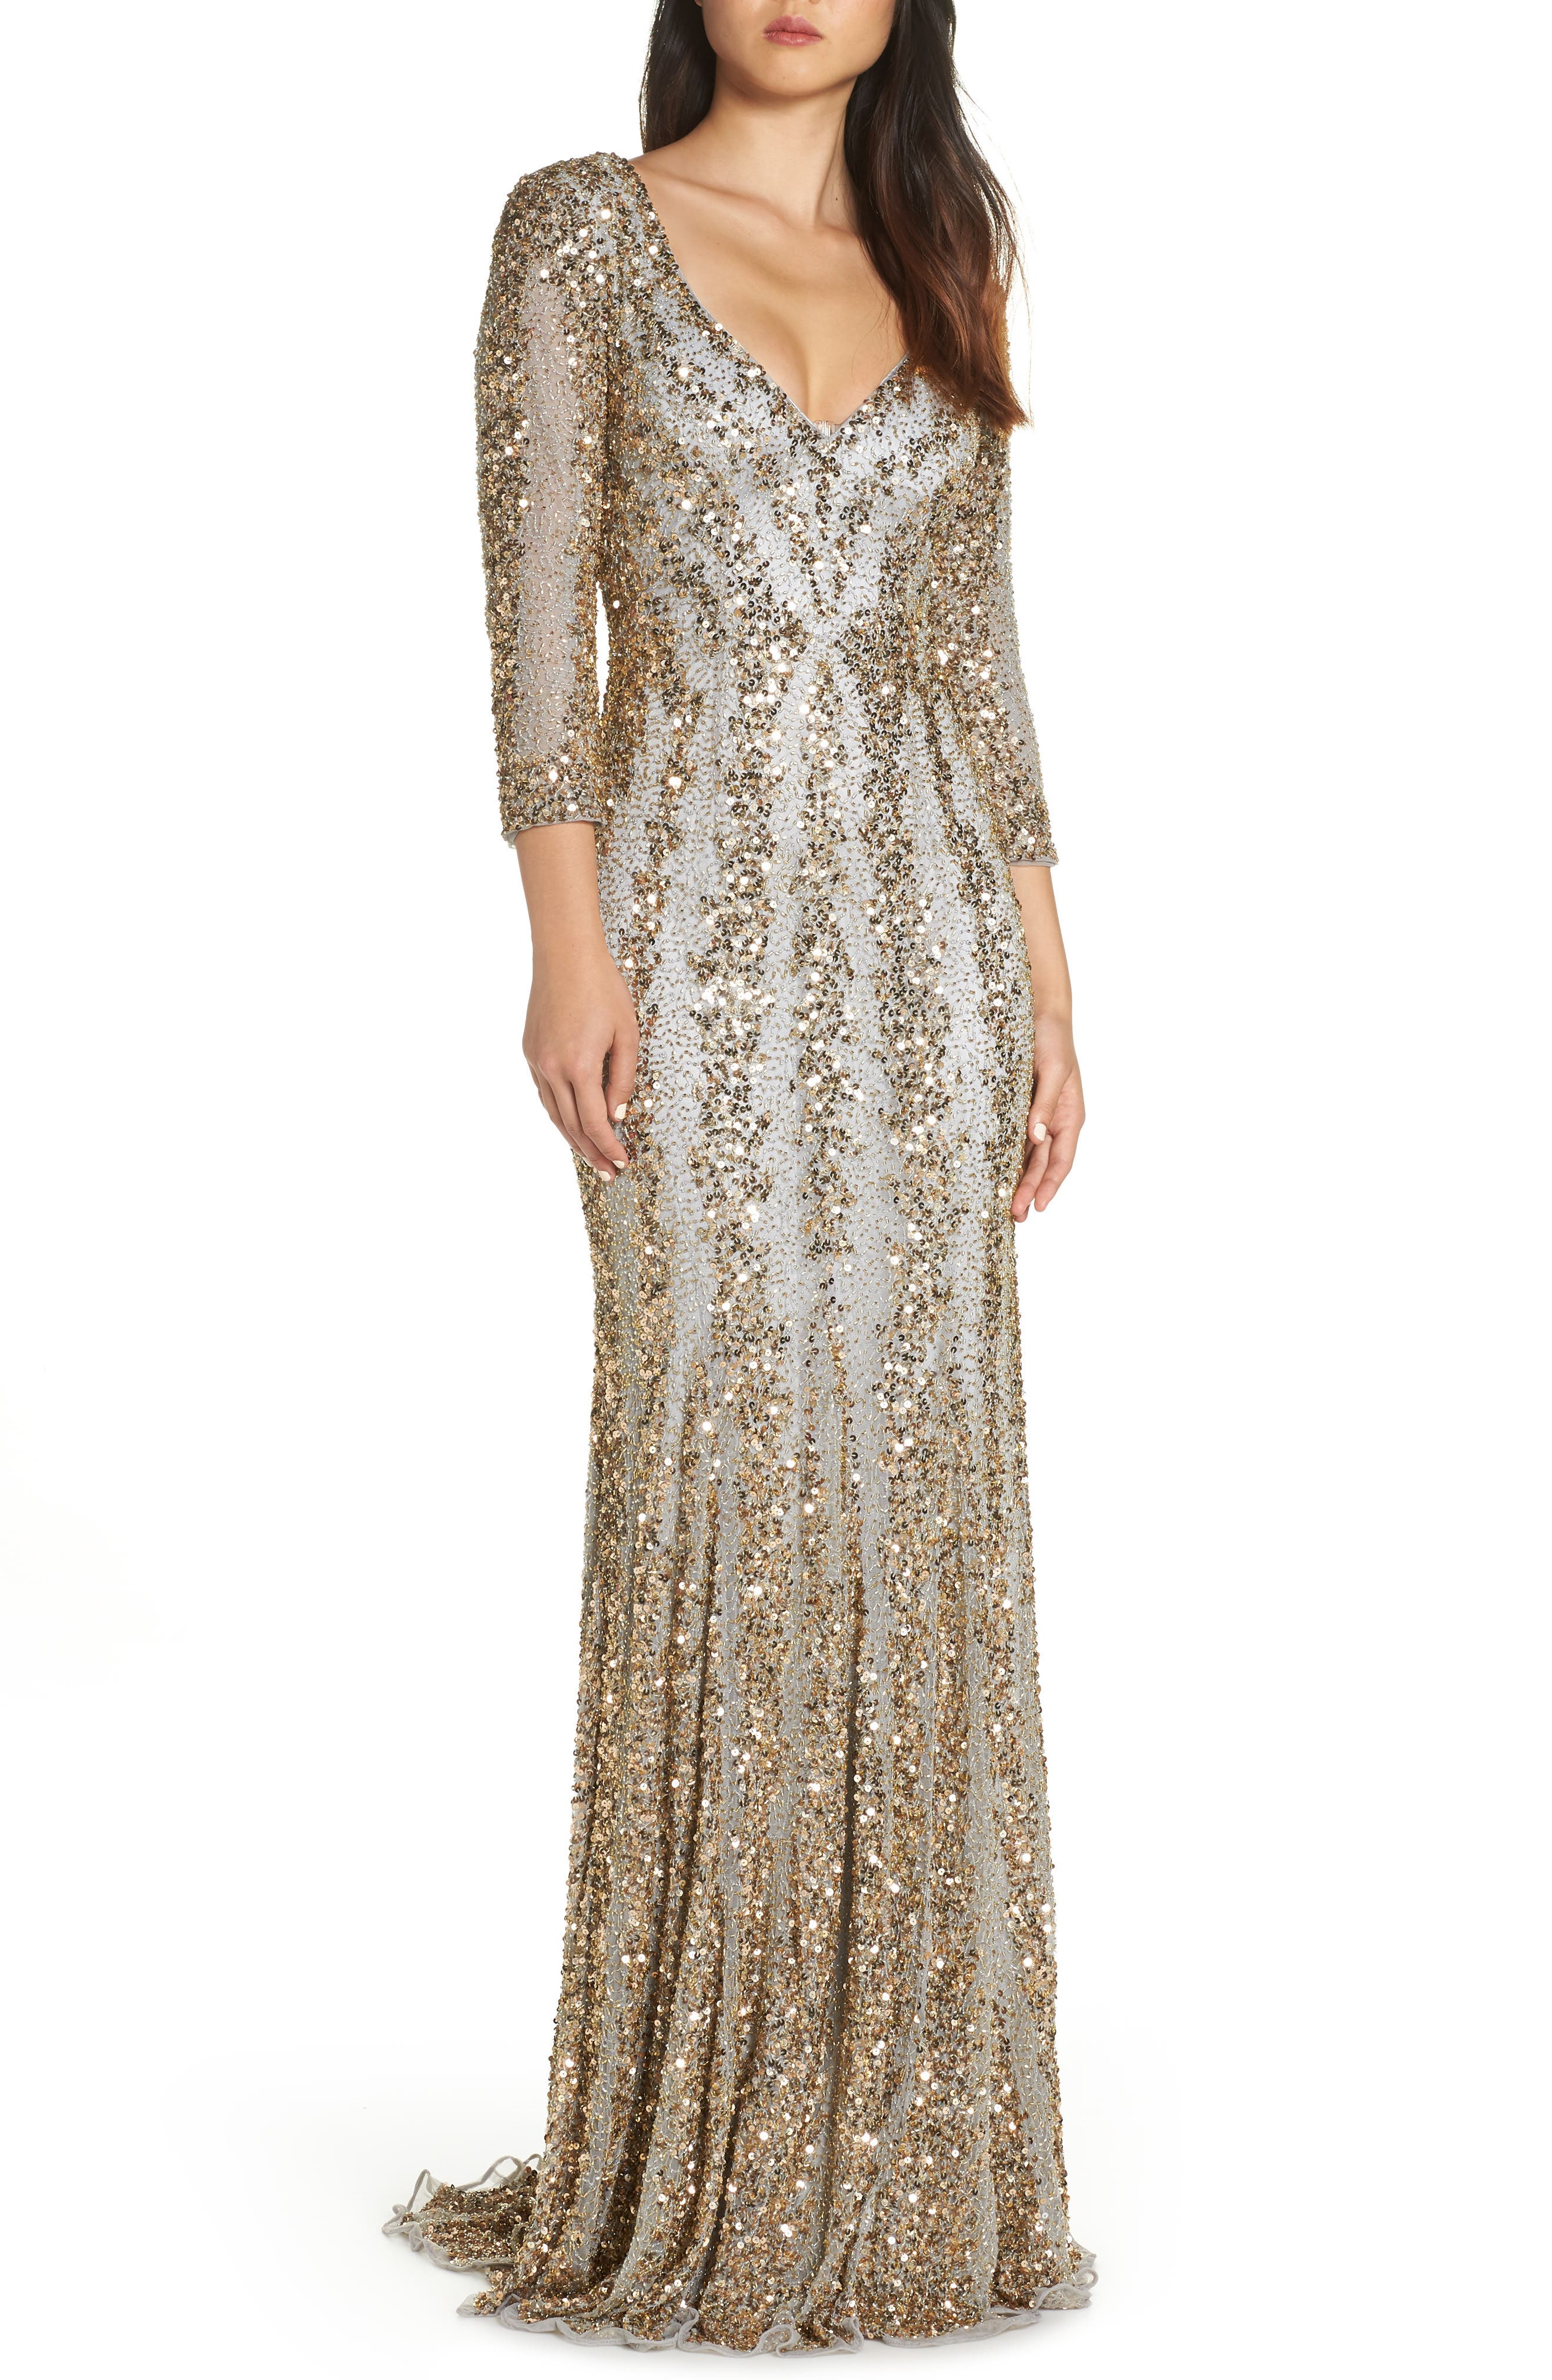 MAC DUGGAL, Sequin Gown, Main thumbnail 1, color, 252